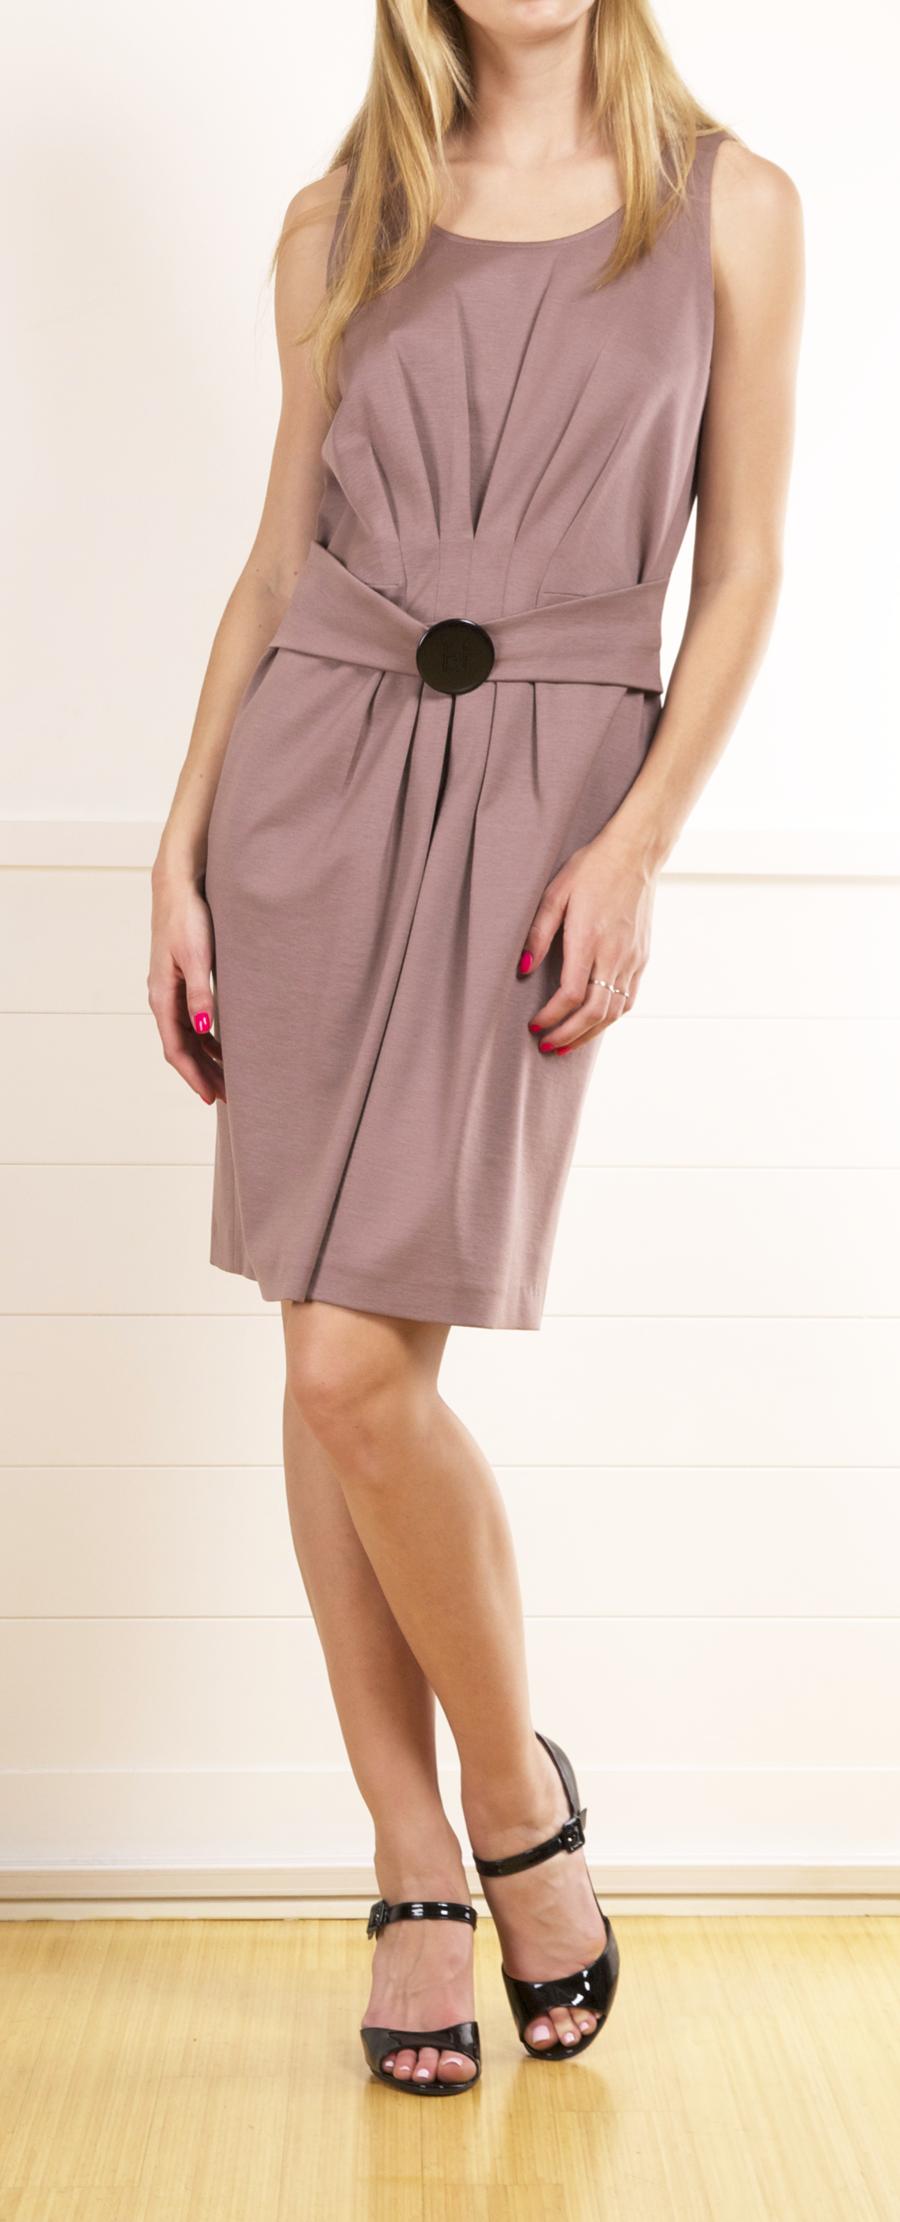 FENDI DRESS @Michelle Coleman-HERS